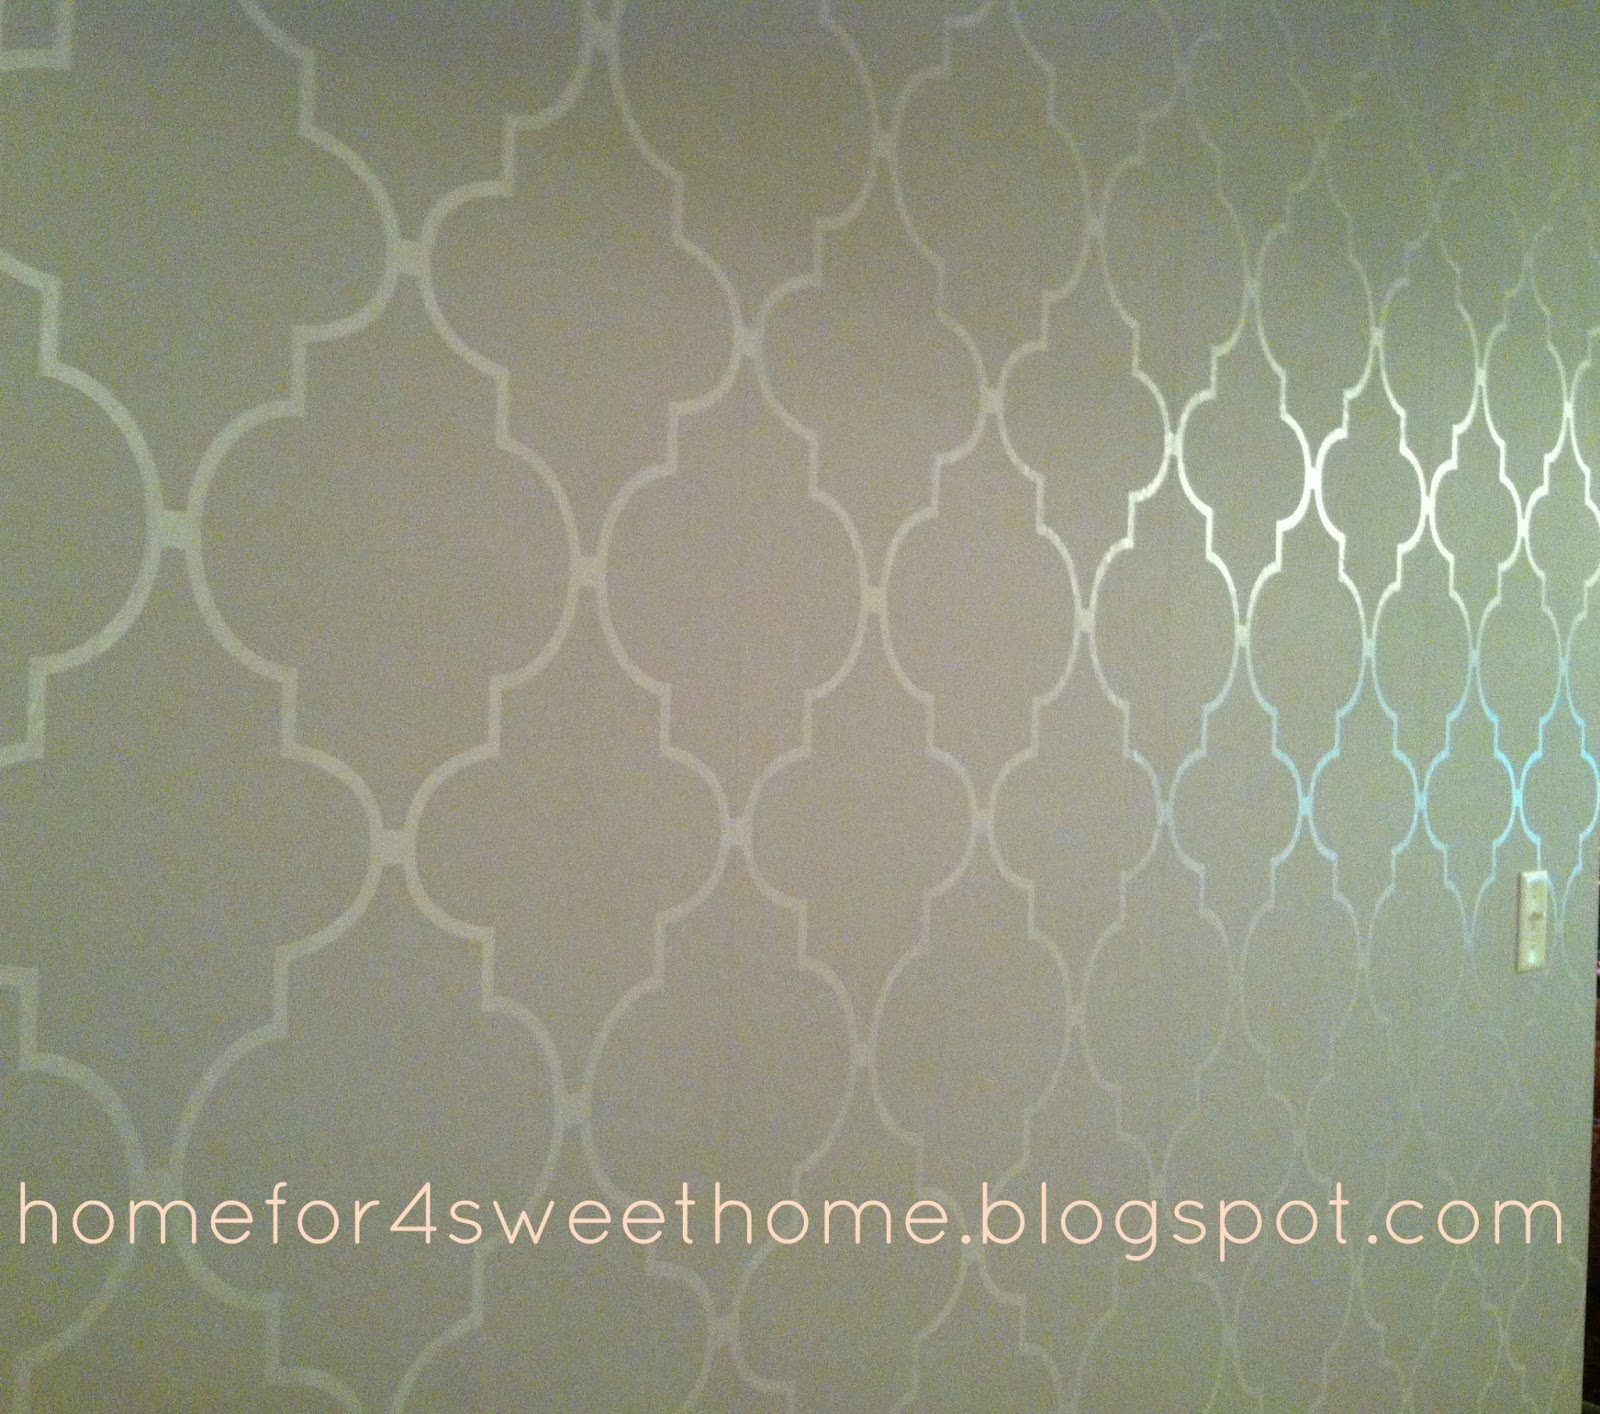 Spanish Tile Wallpaper PicsWallpapercom 1600x1414